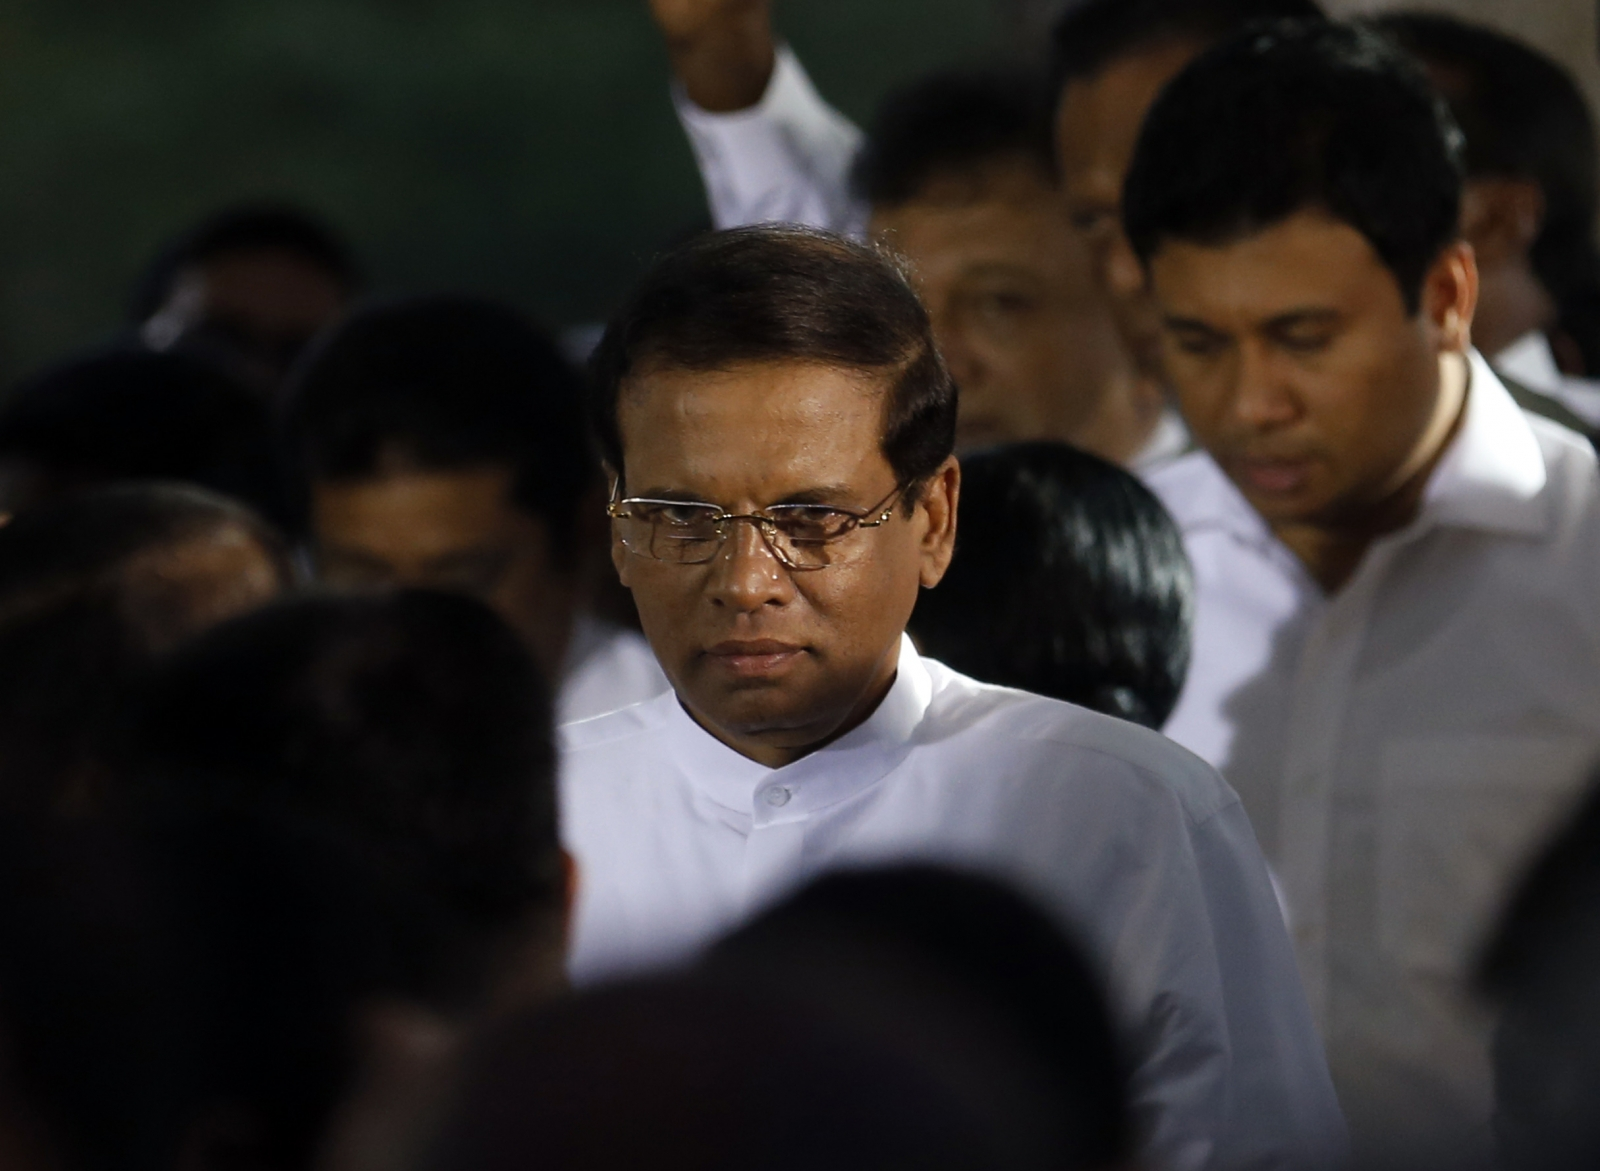 Sri Lanka's newly elected President Maithripala Sirisena